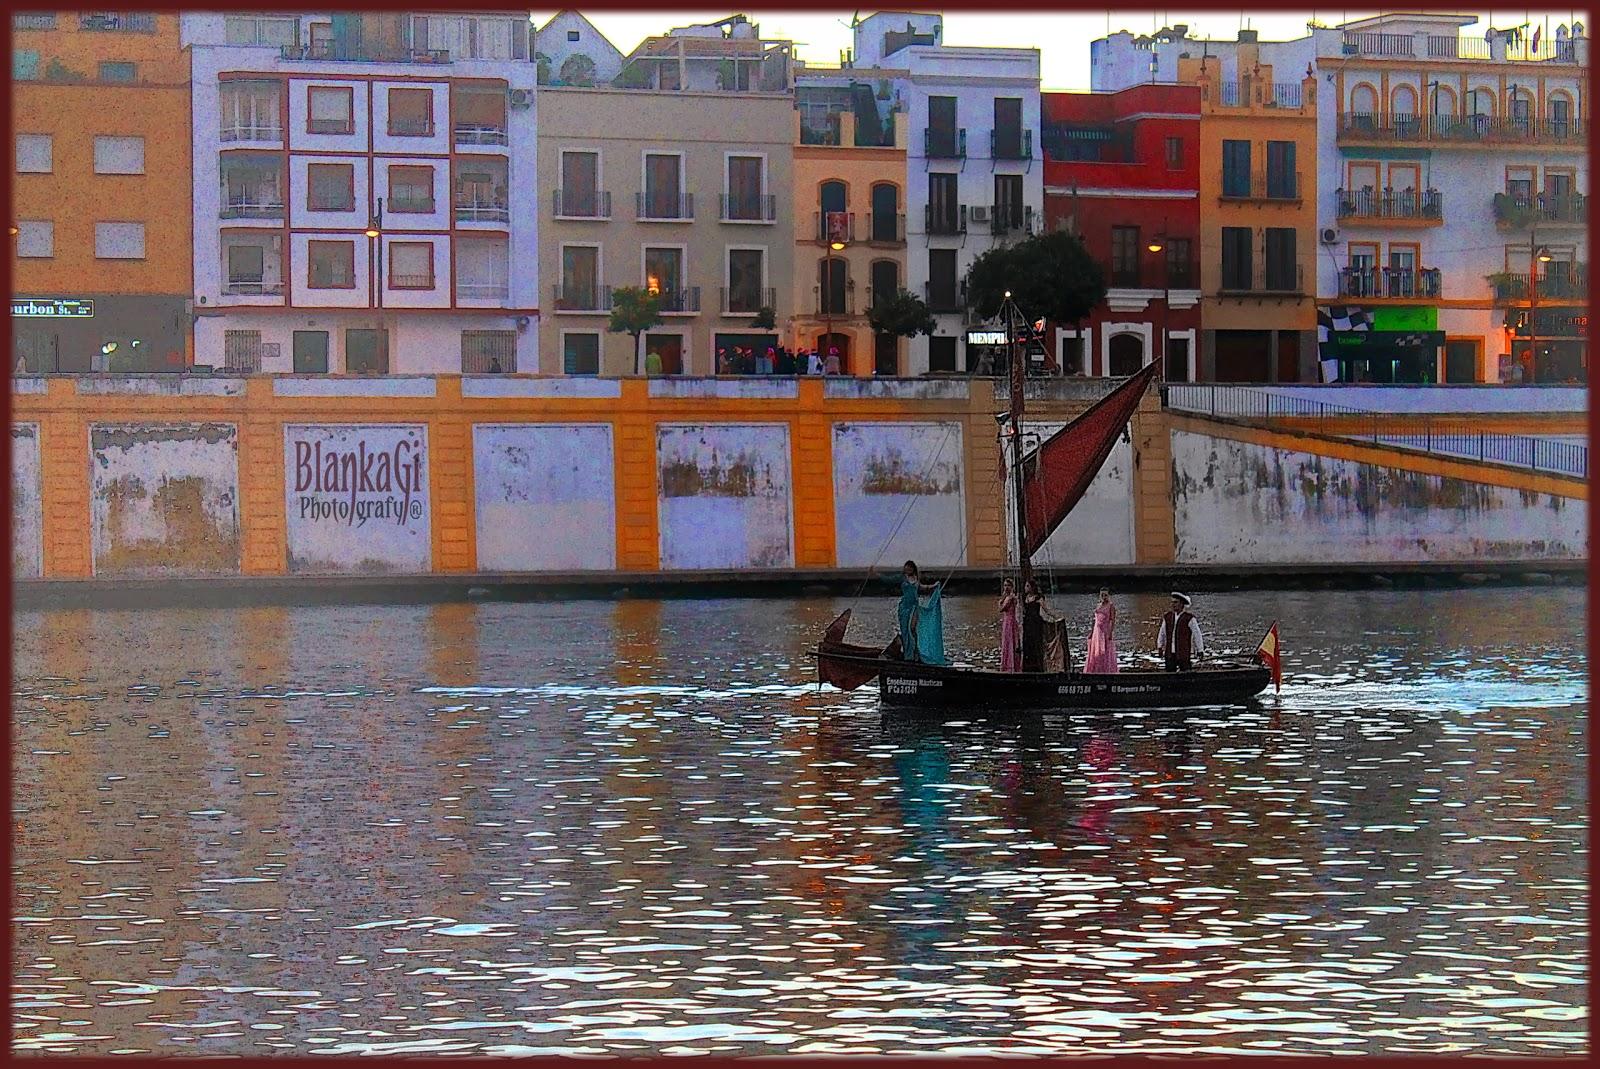 Boat ride through Guadalquivir